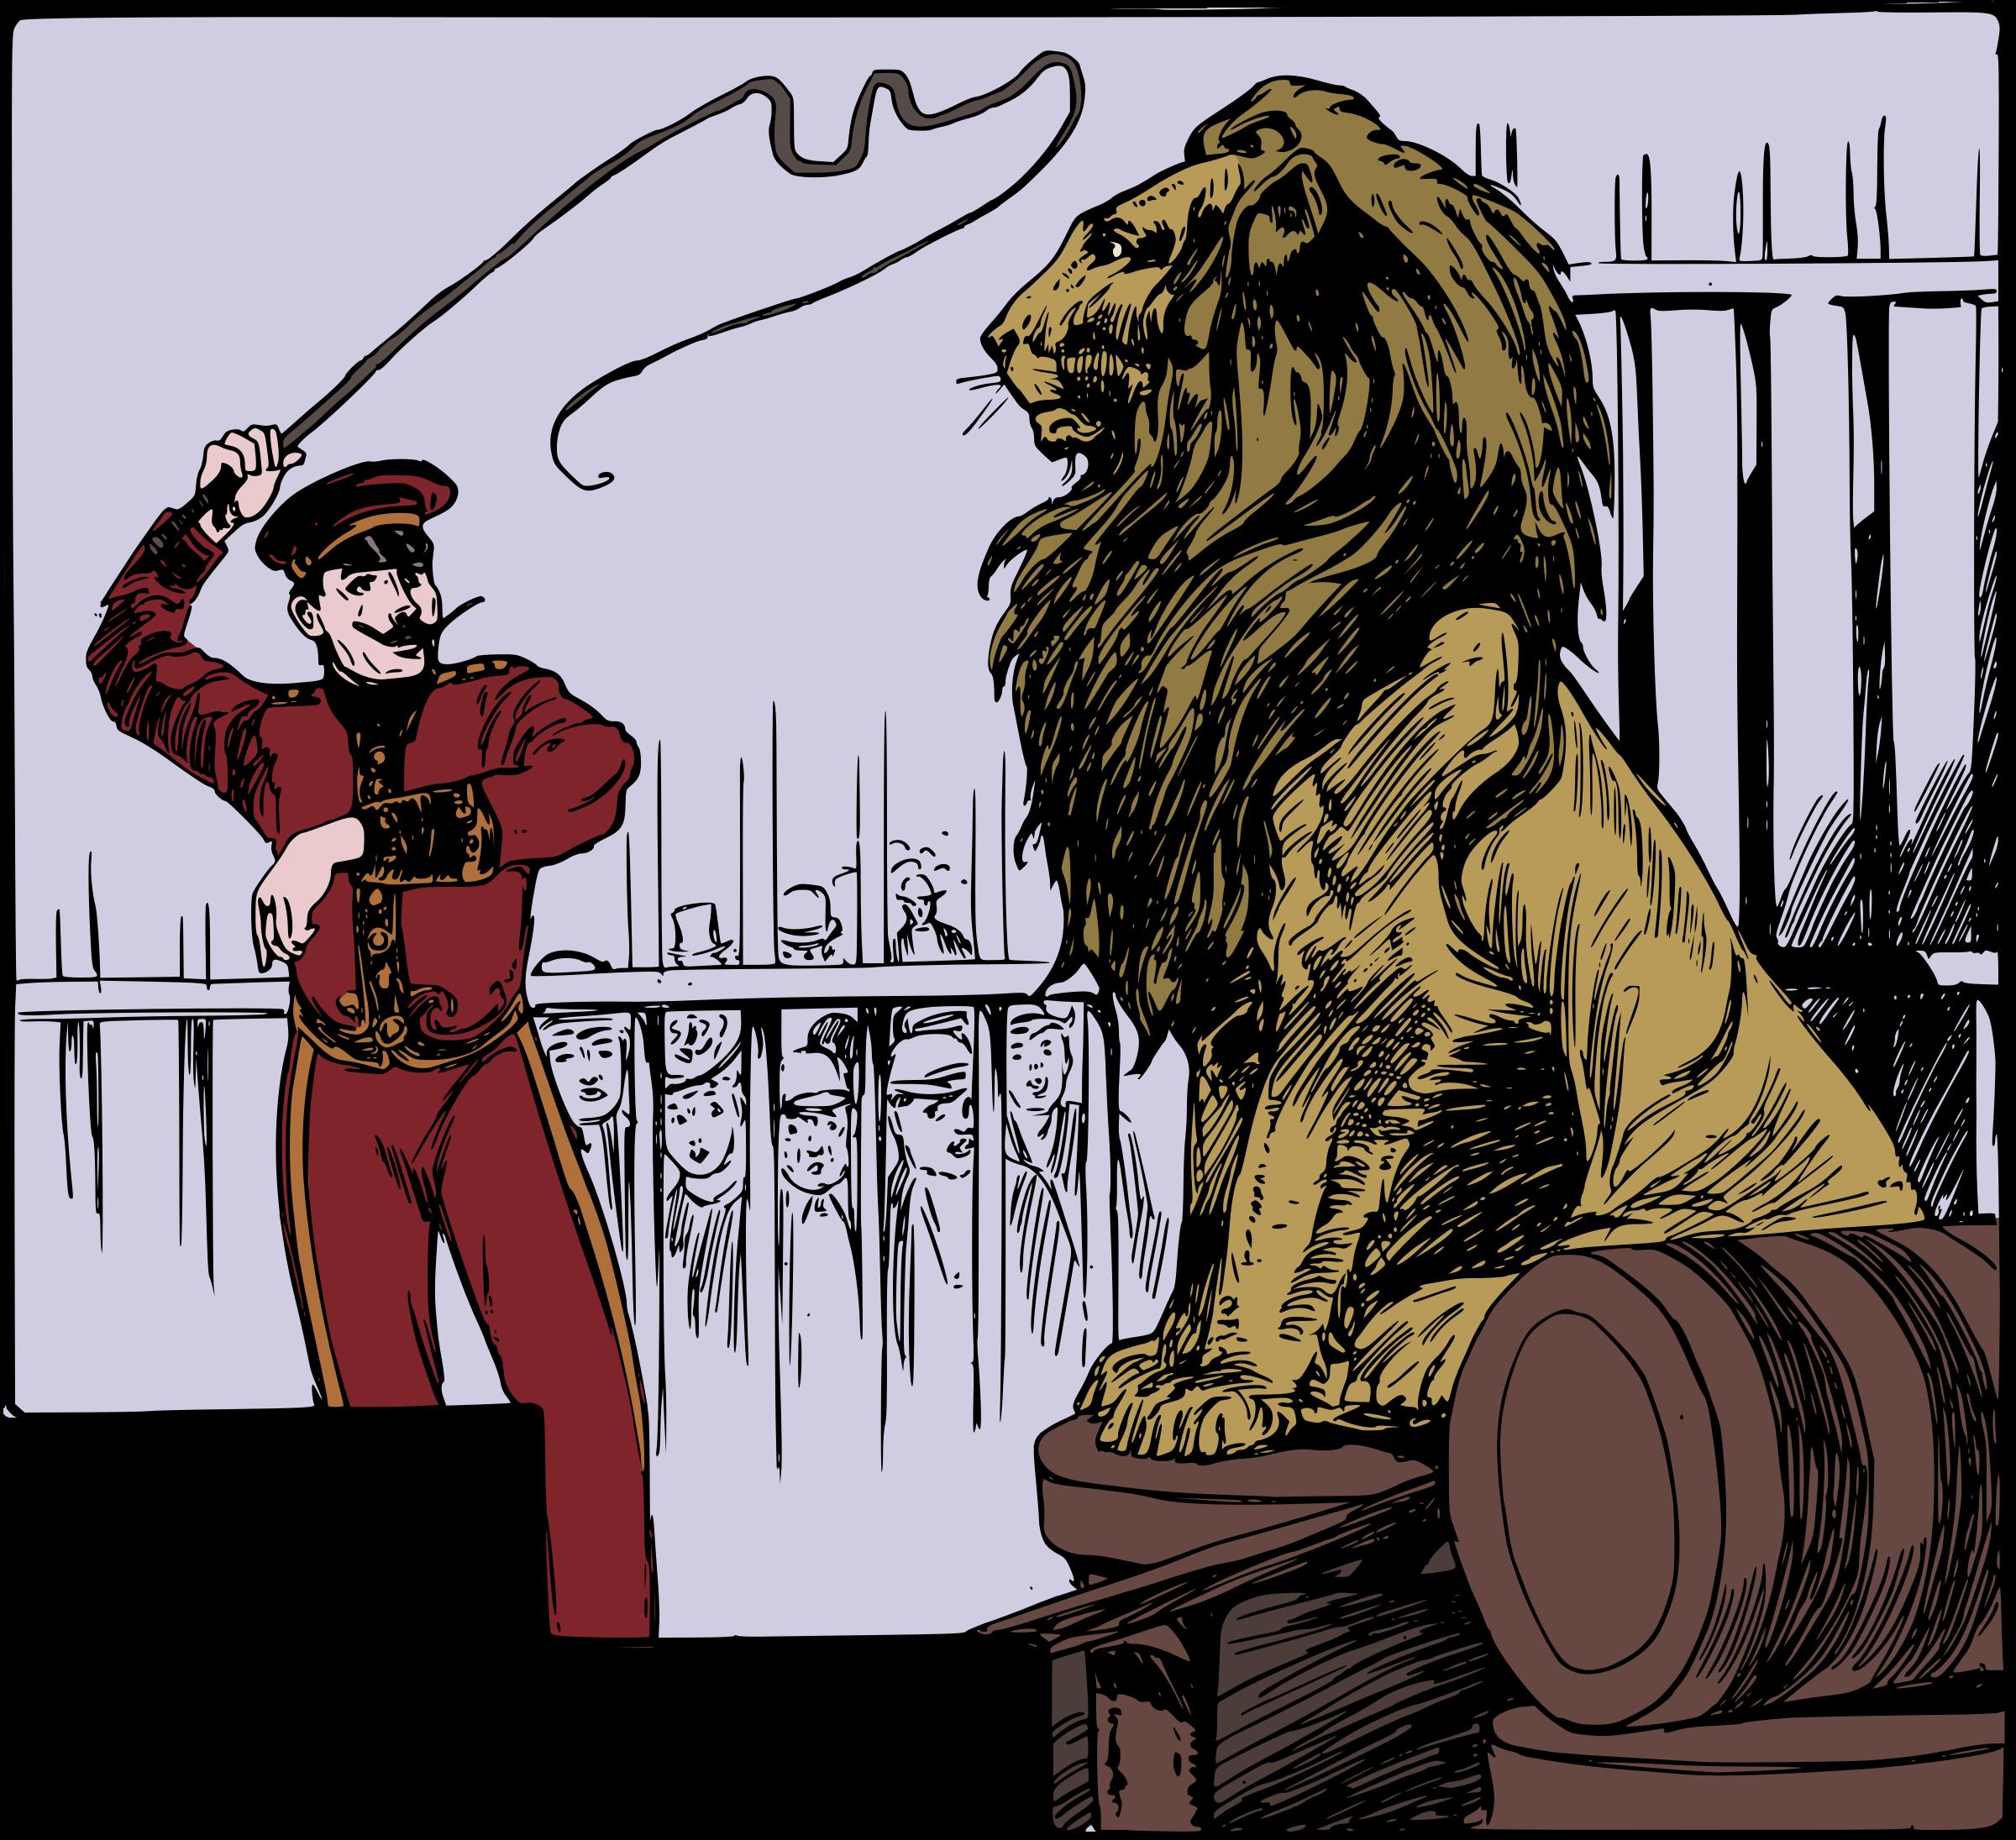 BIG IMAGE (PNG) - Lion Tamer PNG